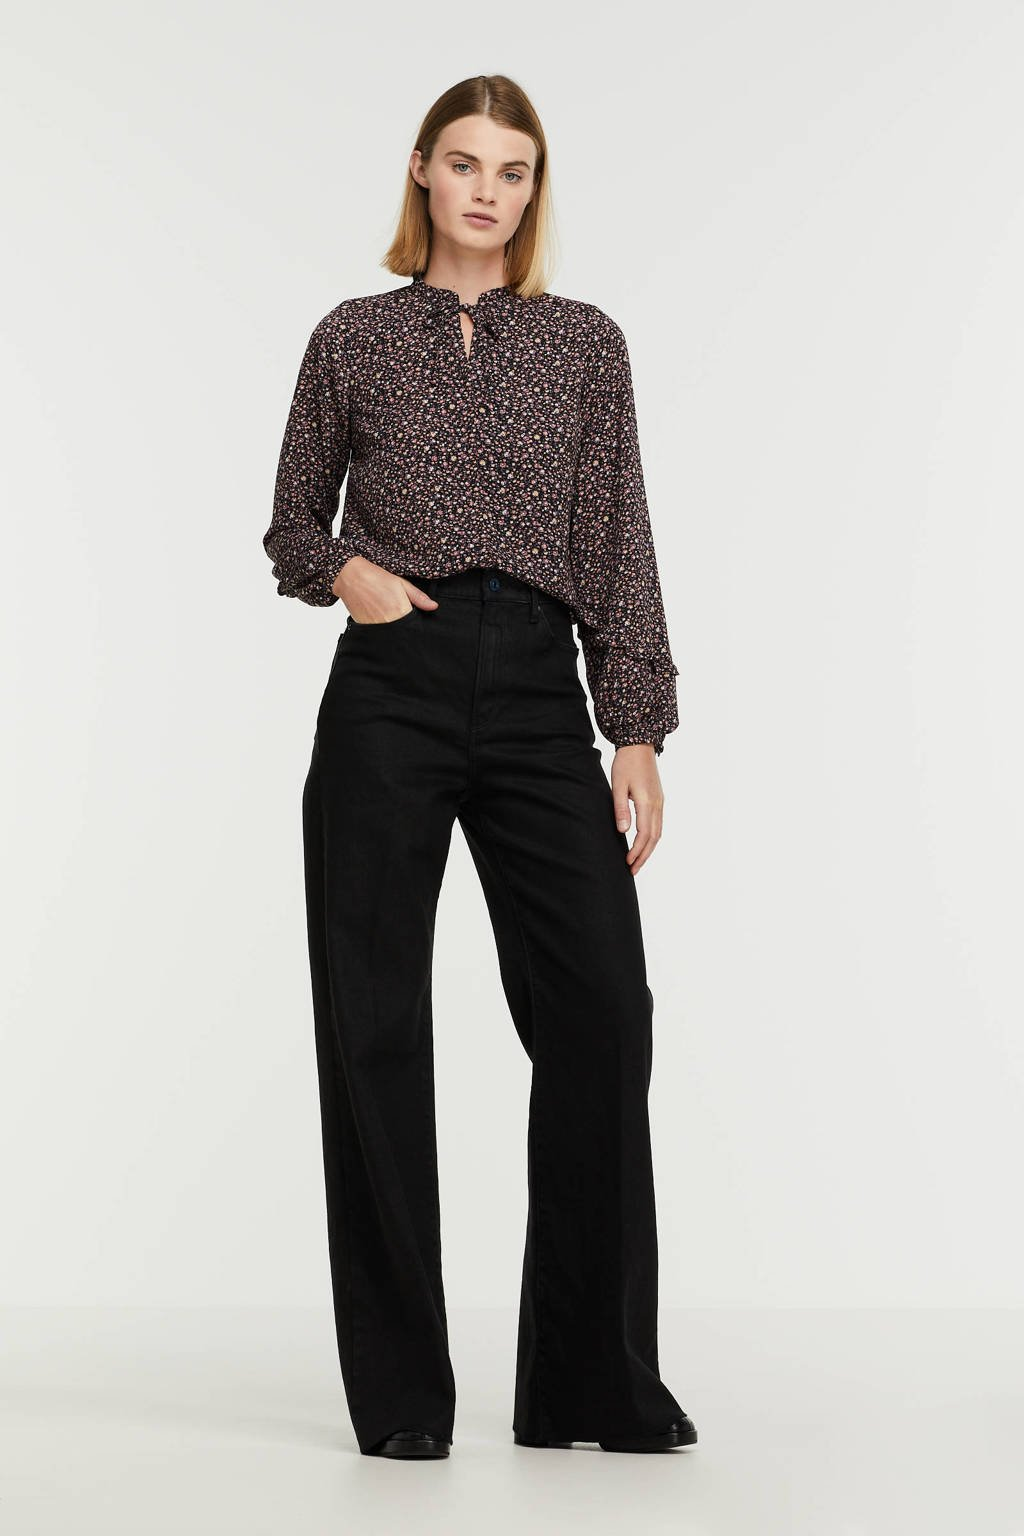 G-Star RAW Deck high waist wide leg jeans pitch black, PITCH BLACK